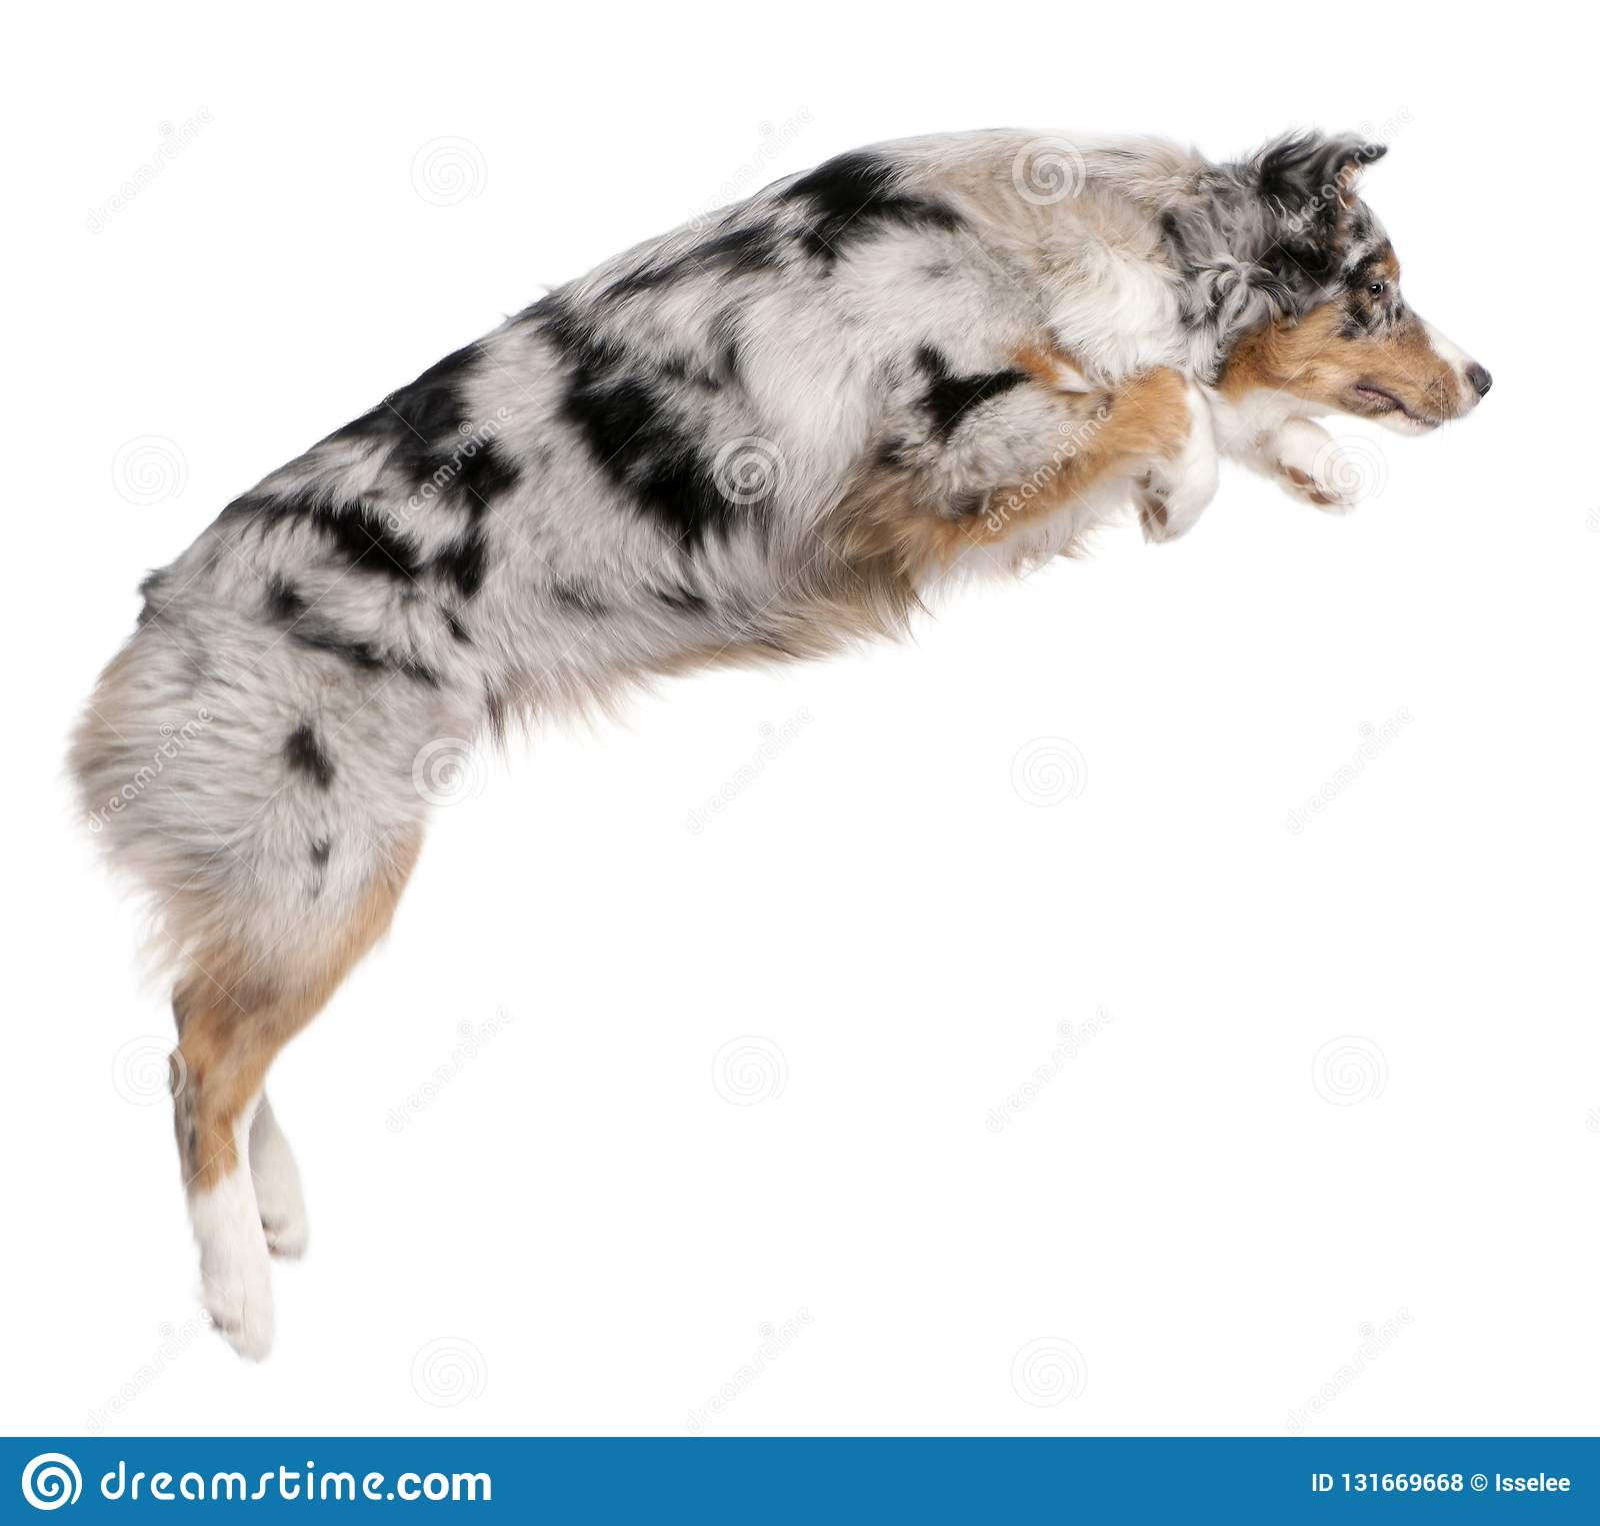 Australian Shepherd dog jumping, 7 months old